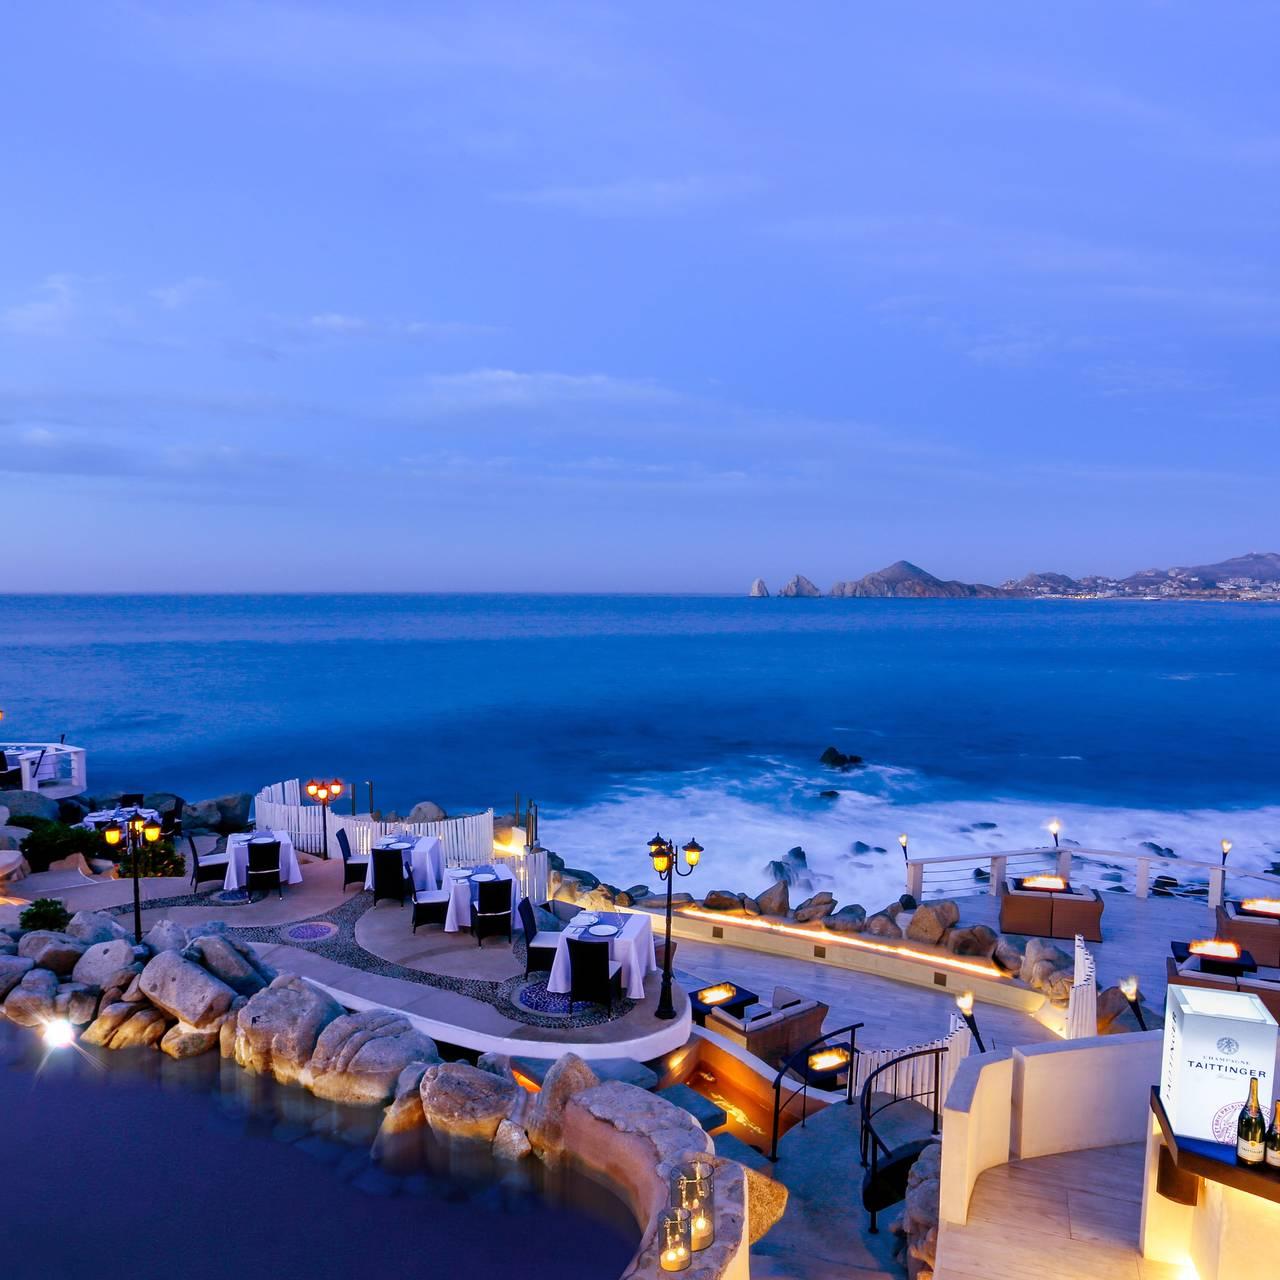 Sunset Da Mona Lisa Restaurant - Cabo San Lucas, BCS | OpenTable